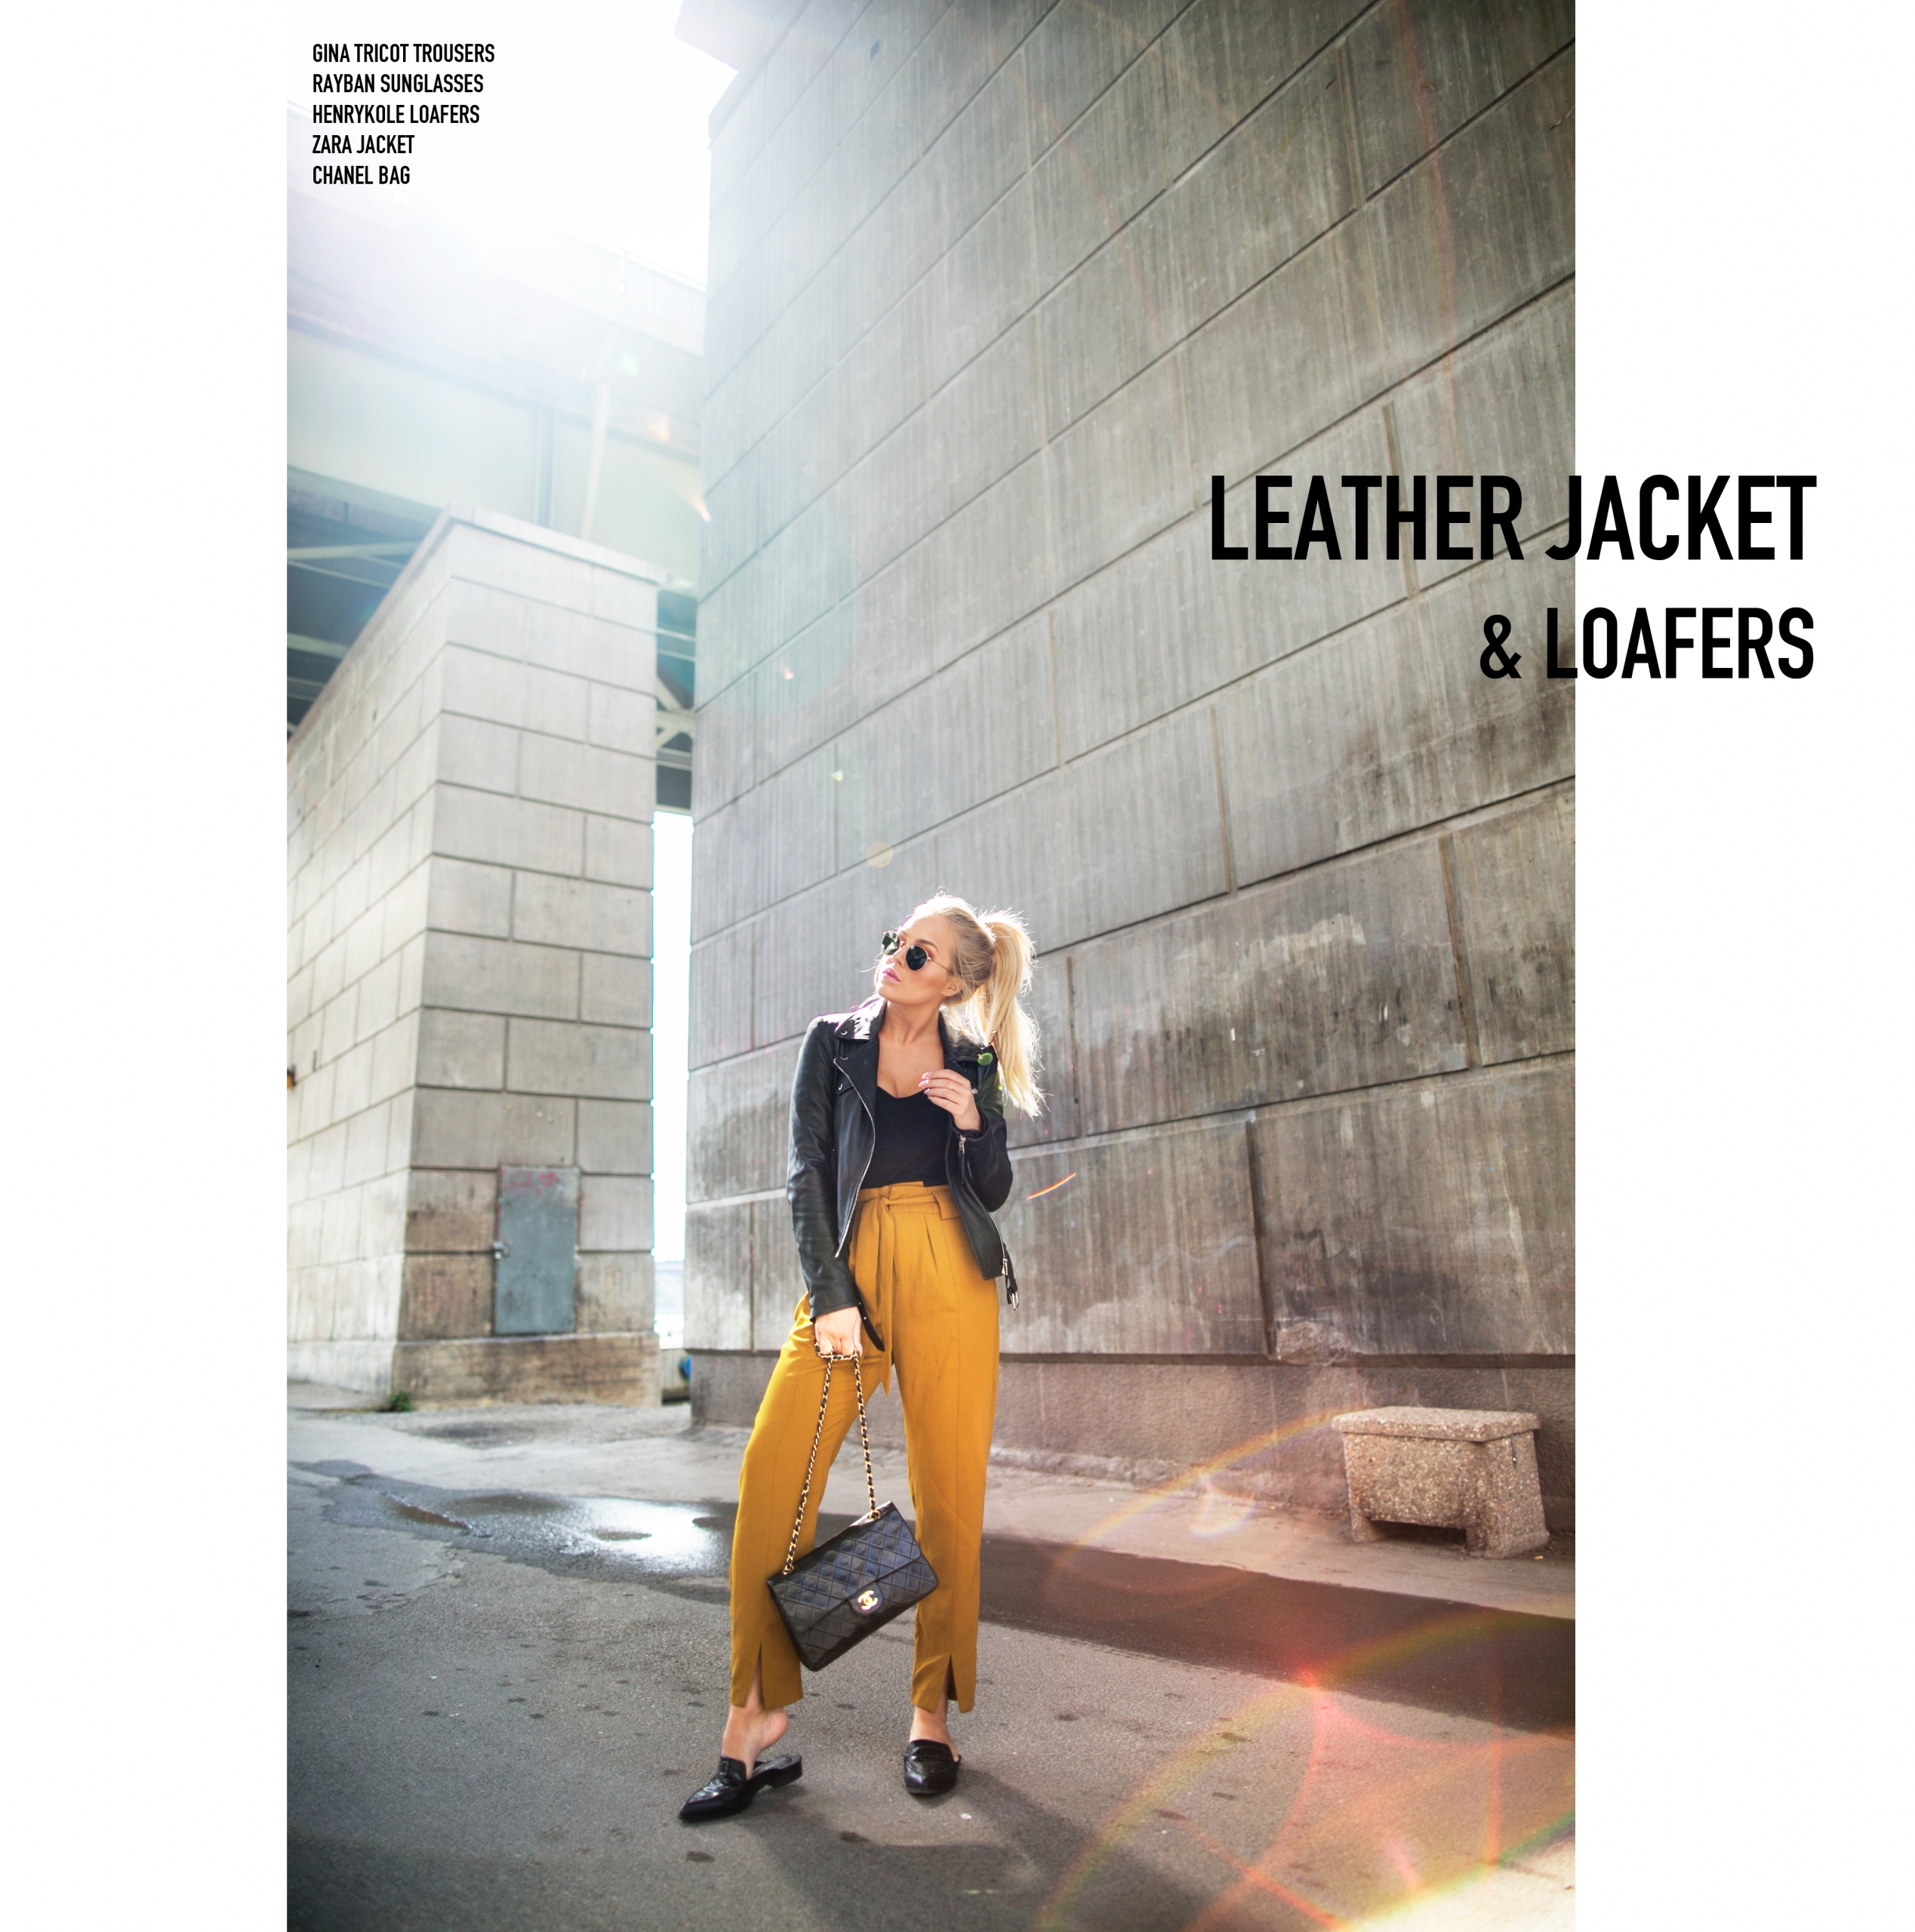 skinnjacka, leatherjacket, rayban, snygga solglasögon